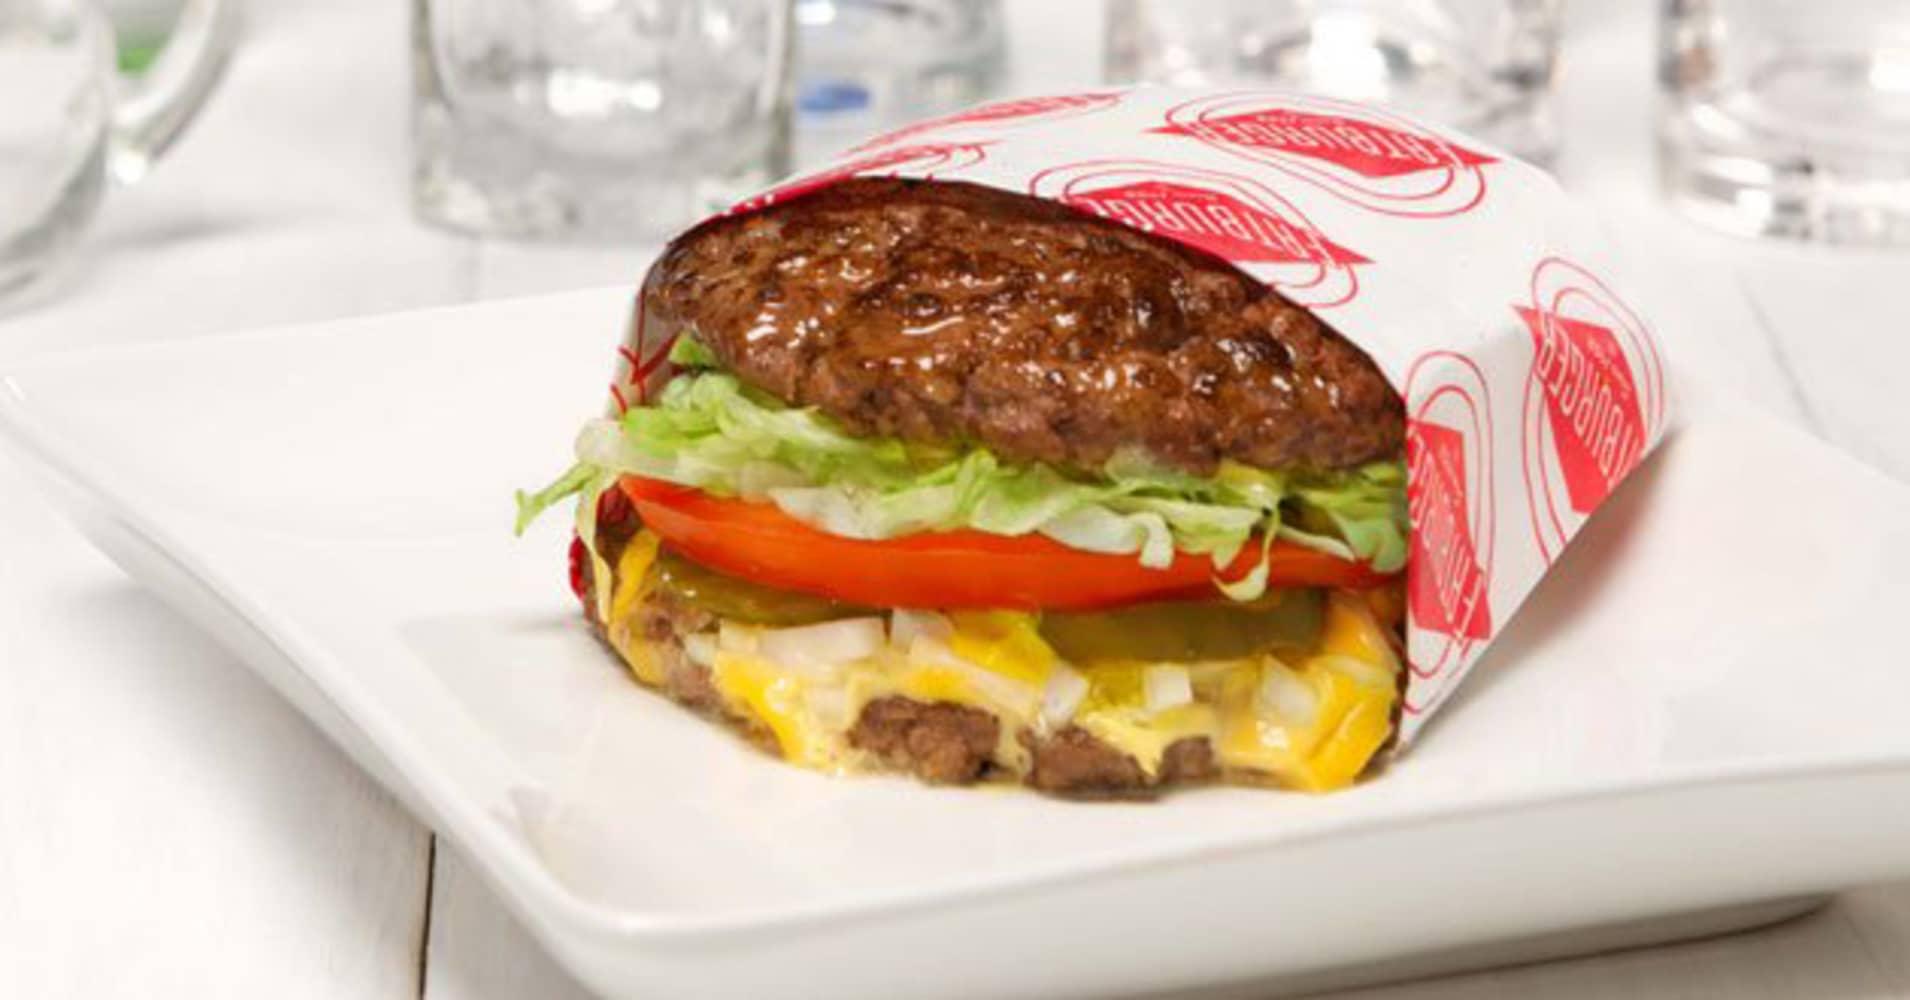 fatburger 39 s 39 skinny burger 39 has an all meat bun. Black Bedroom Furniture Sets. Home Design Ideas